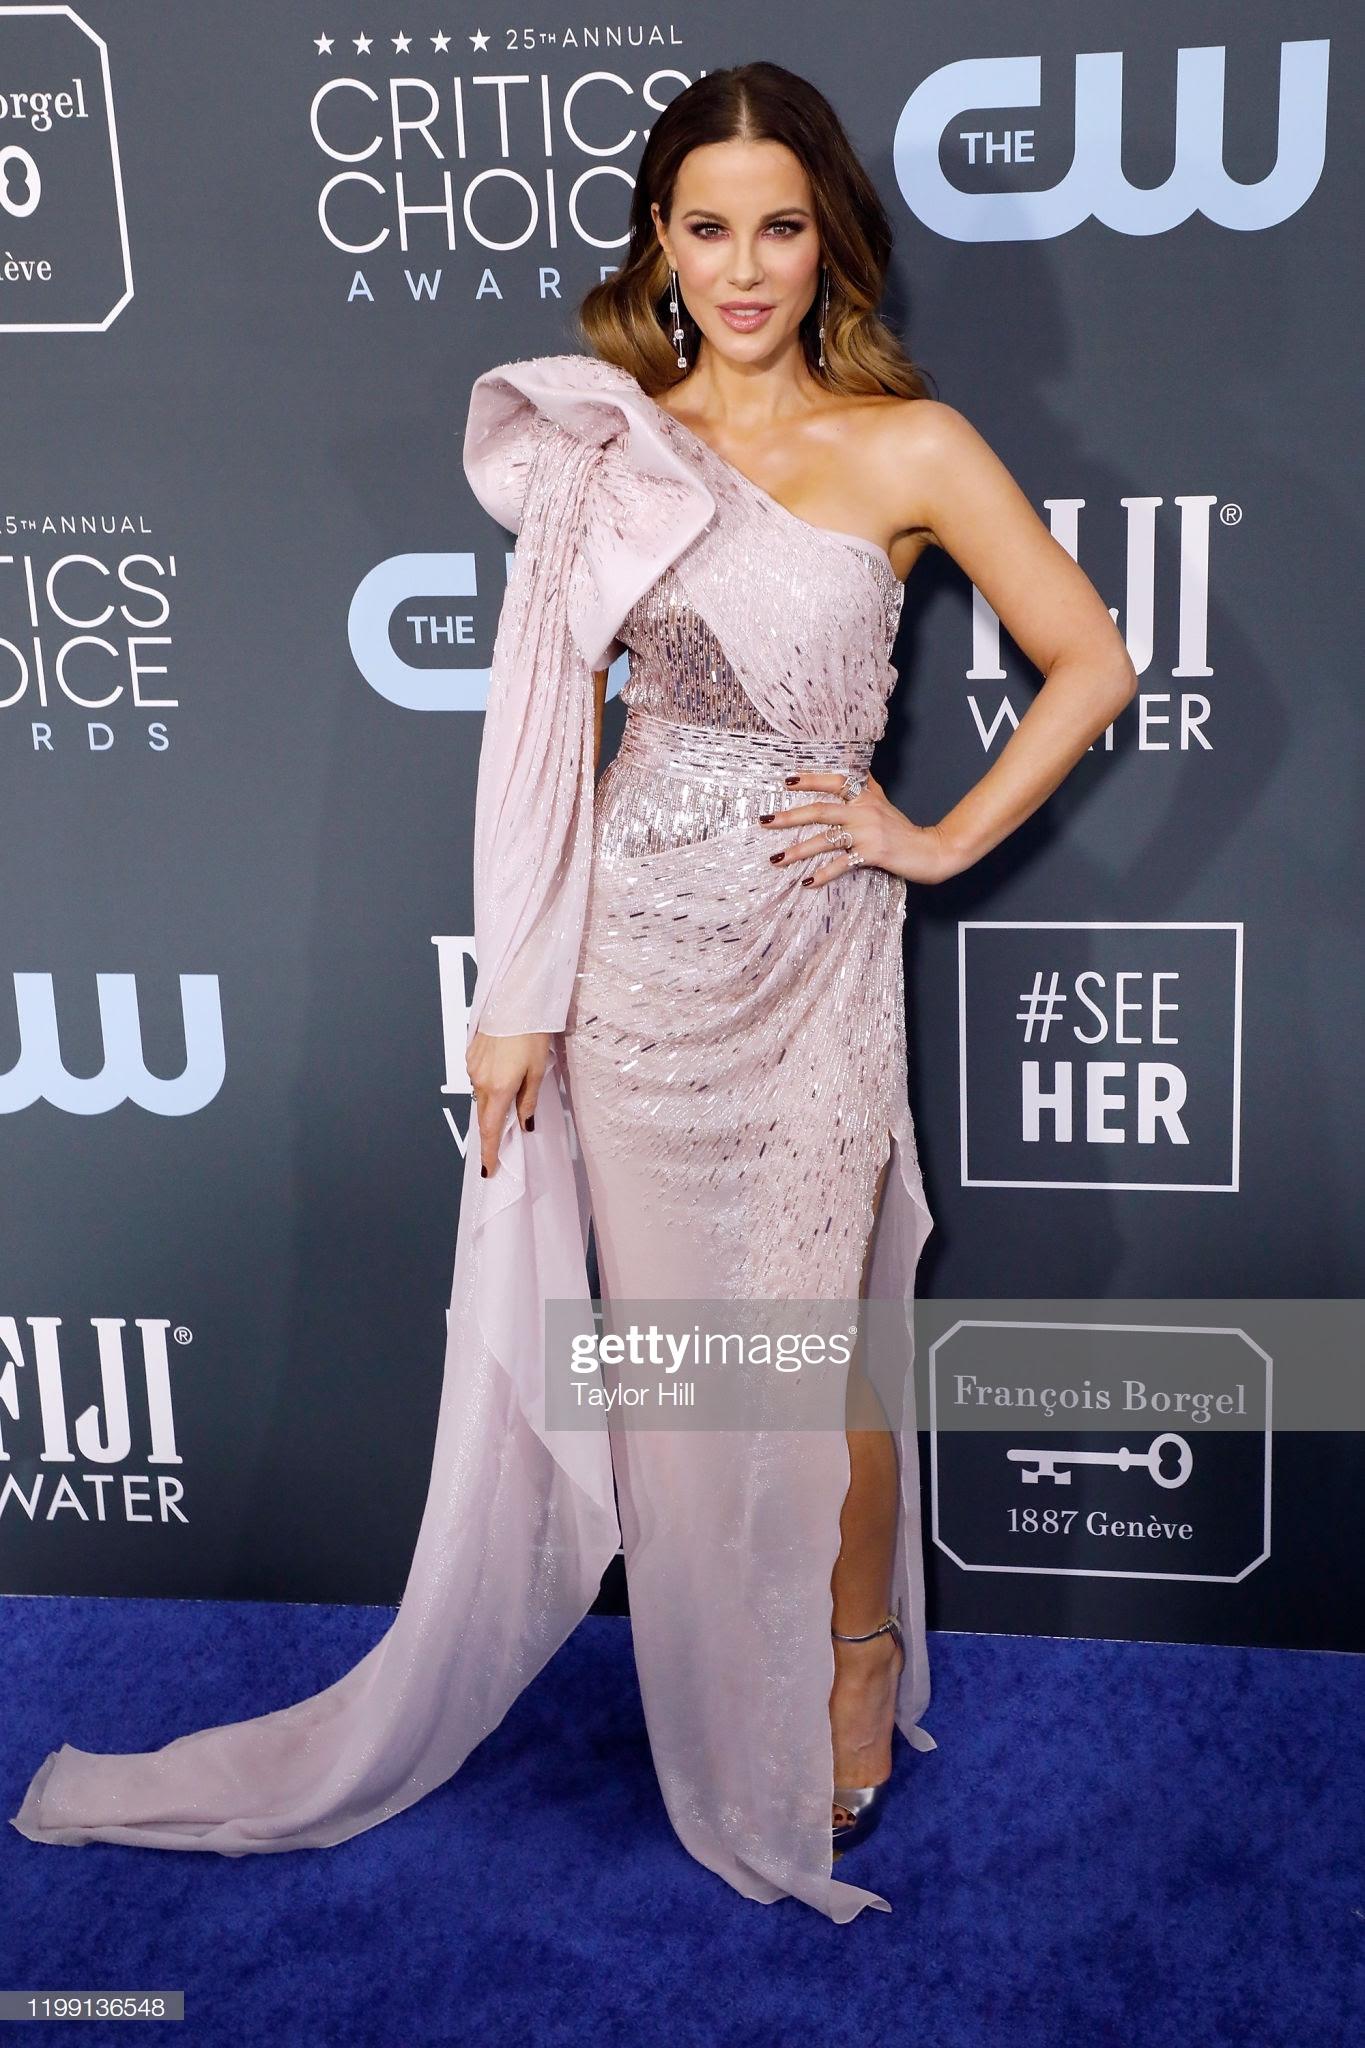 a8917f44 a895 45f9 acc4 ca5c39ed9466 - Jennifer Lopez y Emily,entre las celebrities que apostaron por Jimmy Choo en los Critics' Choice Awards